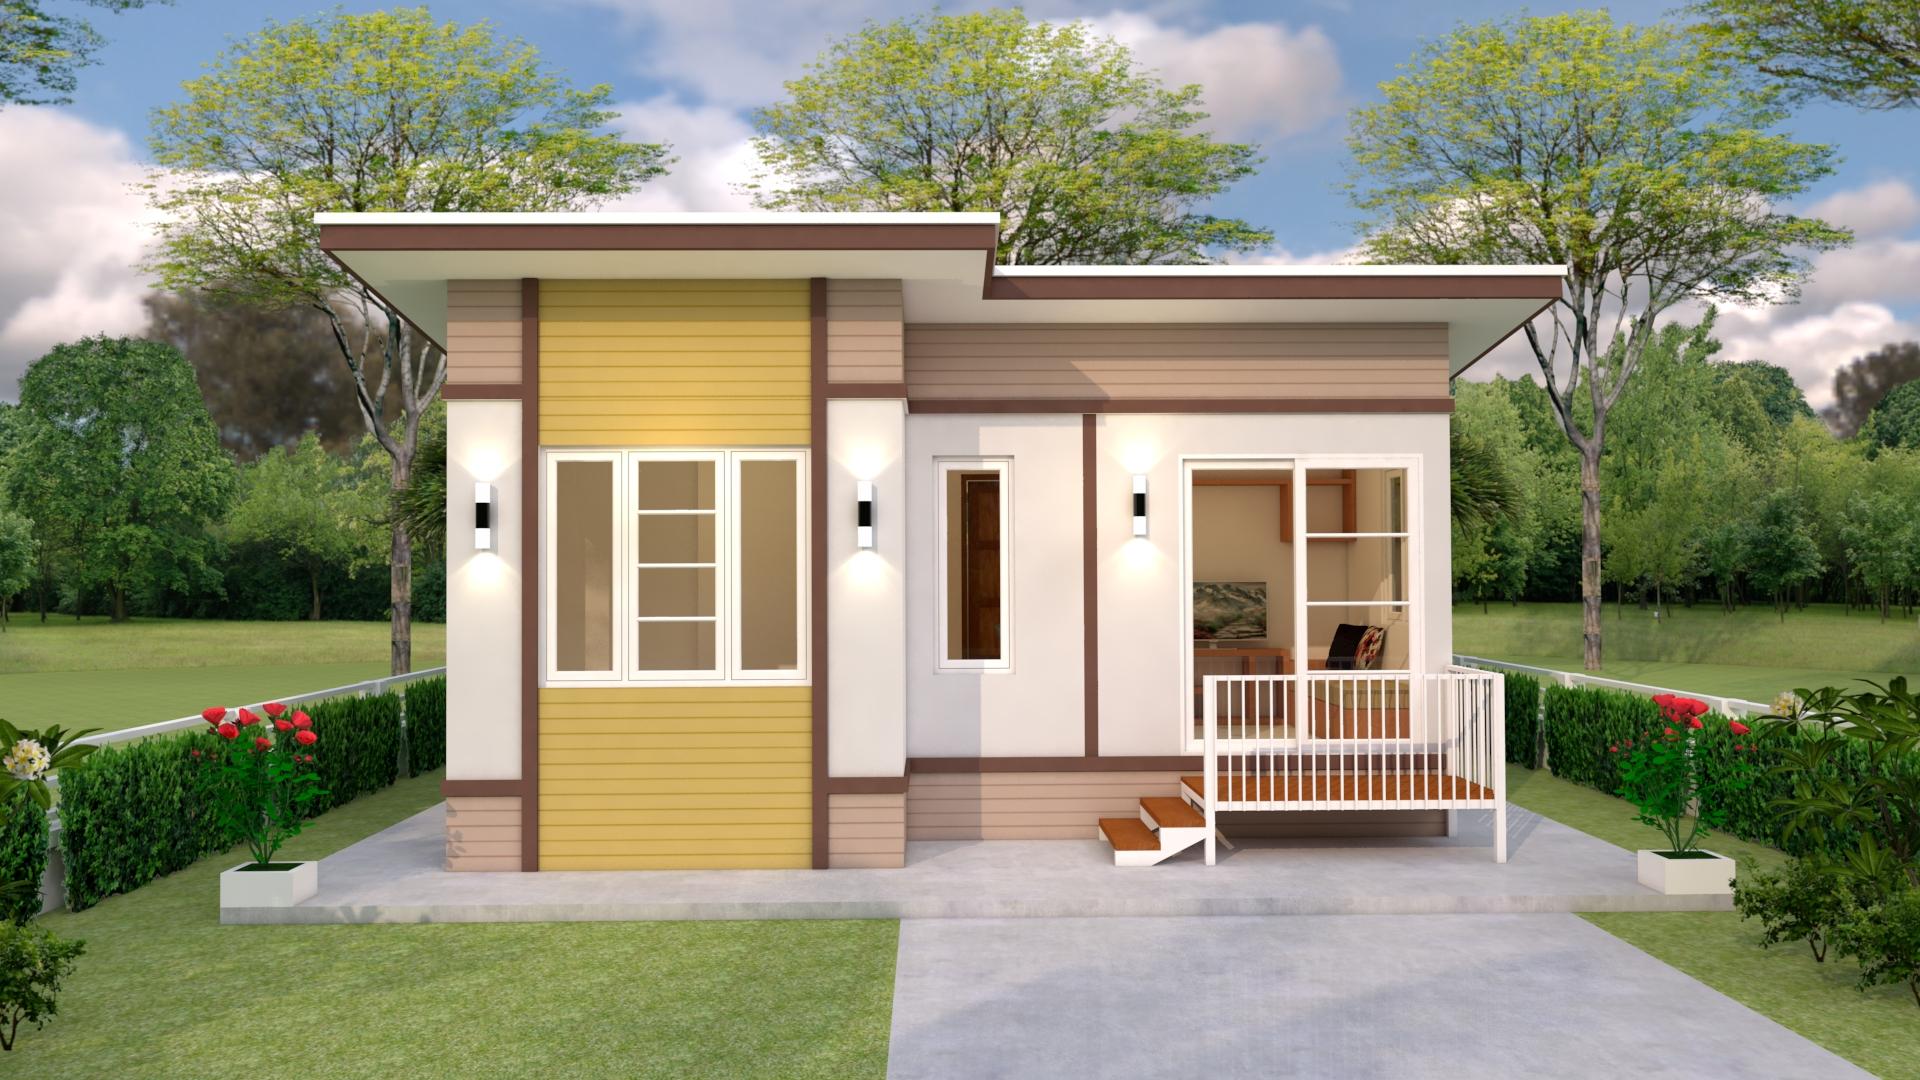 Small Budget House 7x6 Meter 23x20 Feet 2